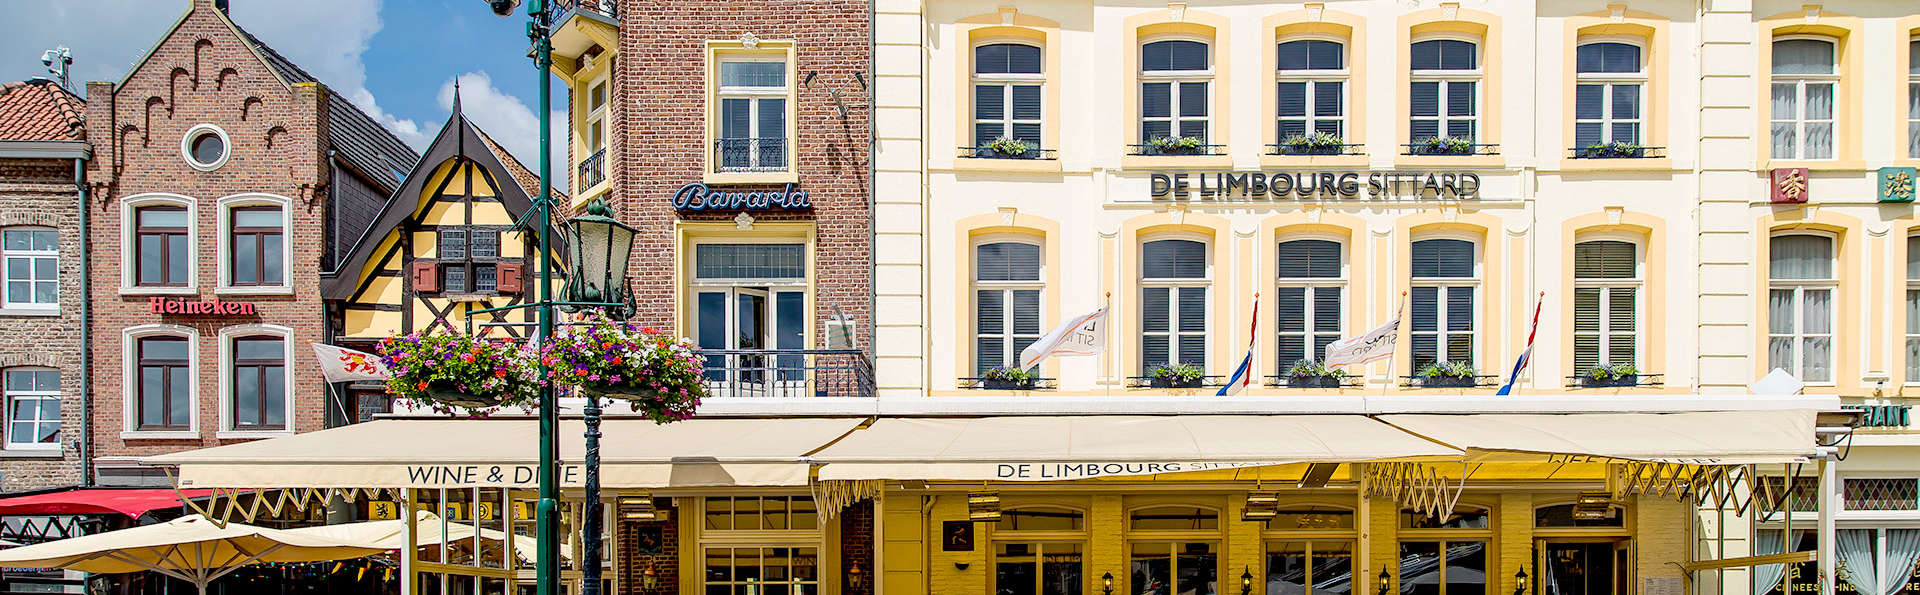 De Limbourg Sittard - Edit_front.jpg